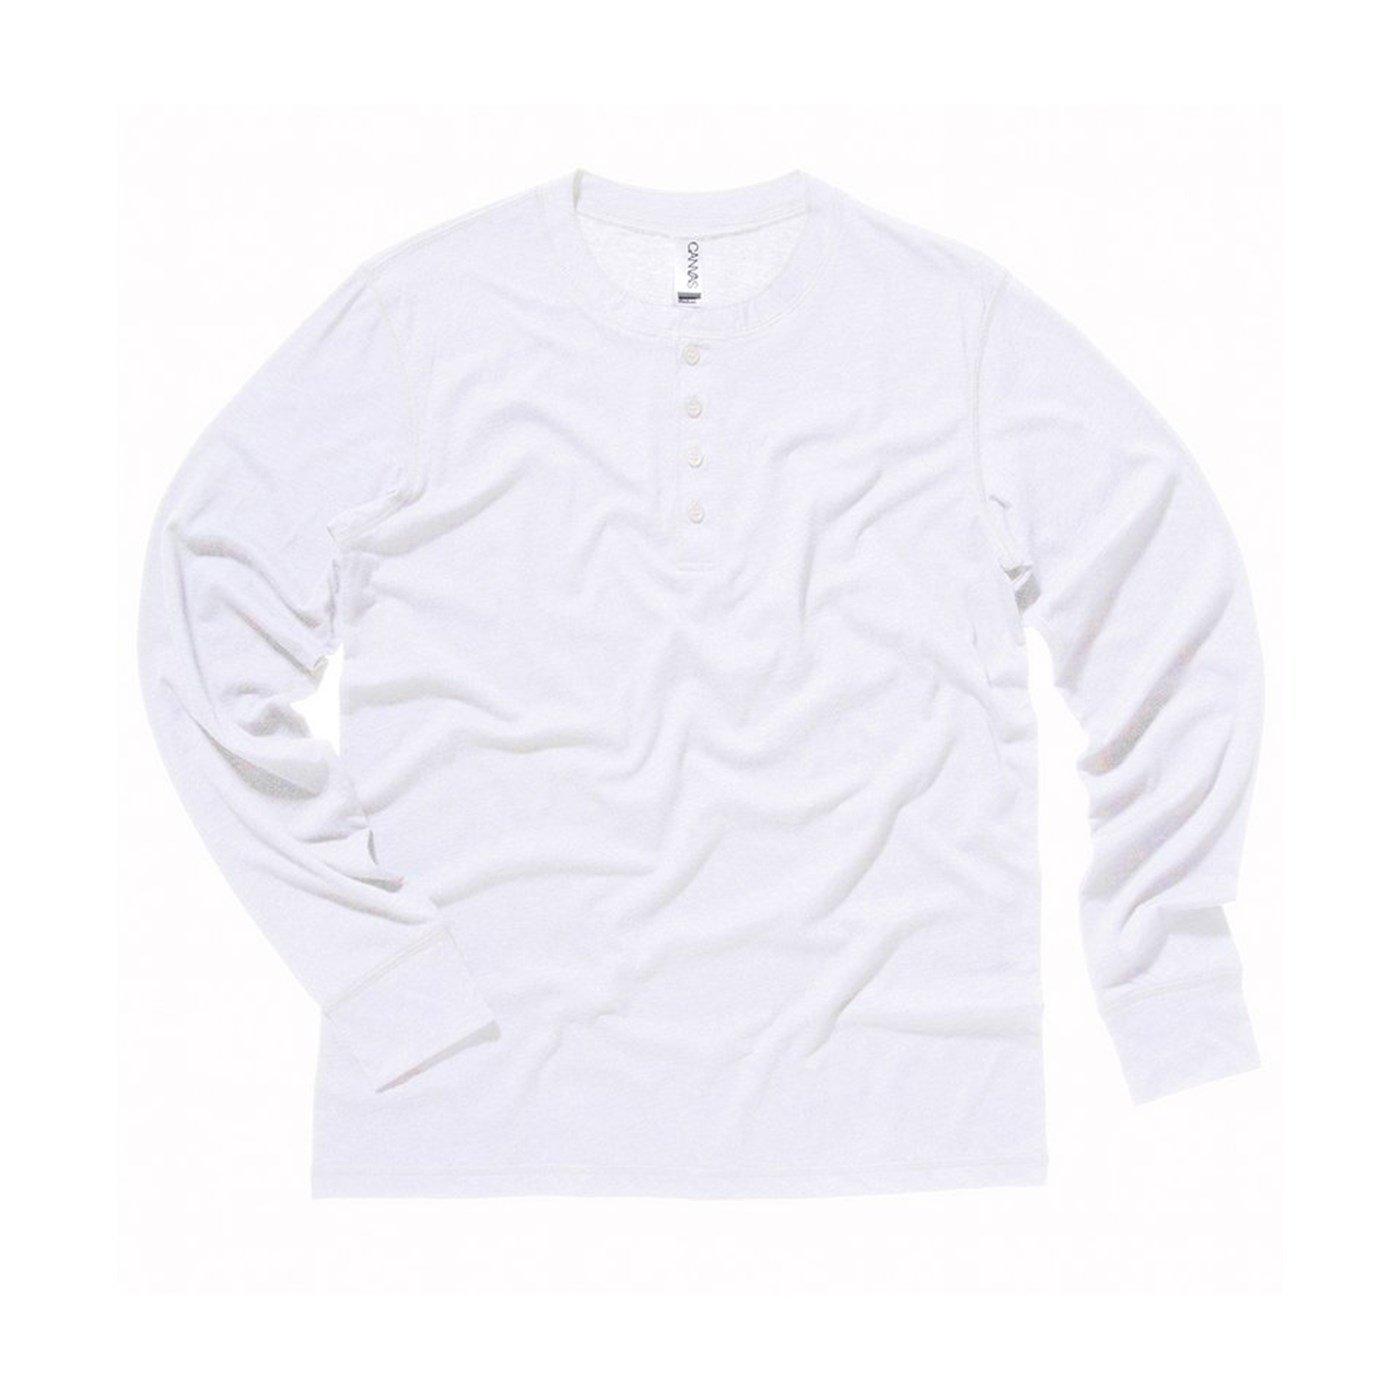 f735ad40 Bella Canvas Men's Henley Jersey Long Sleeve T-Shirt. Product Code - CV006